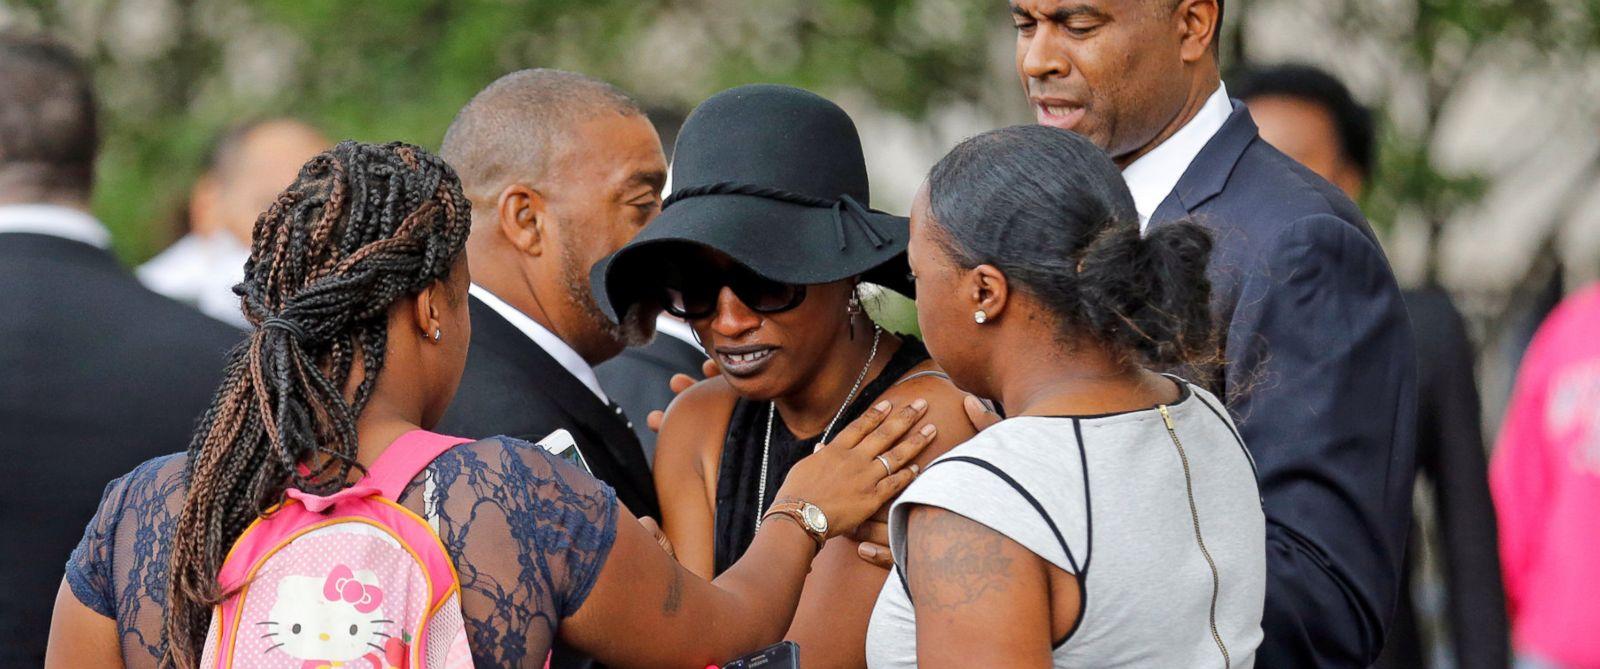 PHOTO: Family members comfort Diamond Reynolds at Philando Castile's funeral (Source: Eric Miller/Reuters)